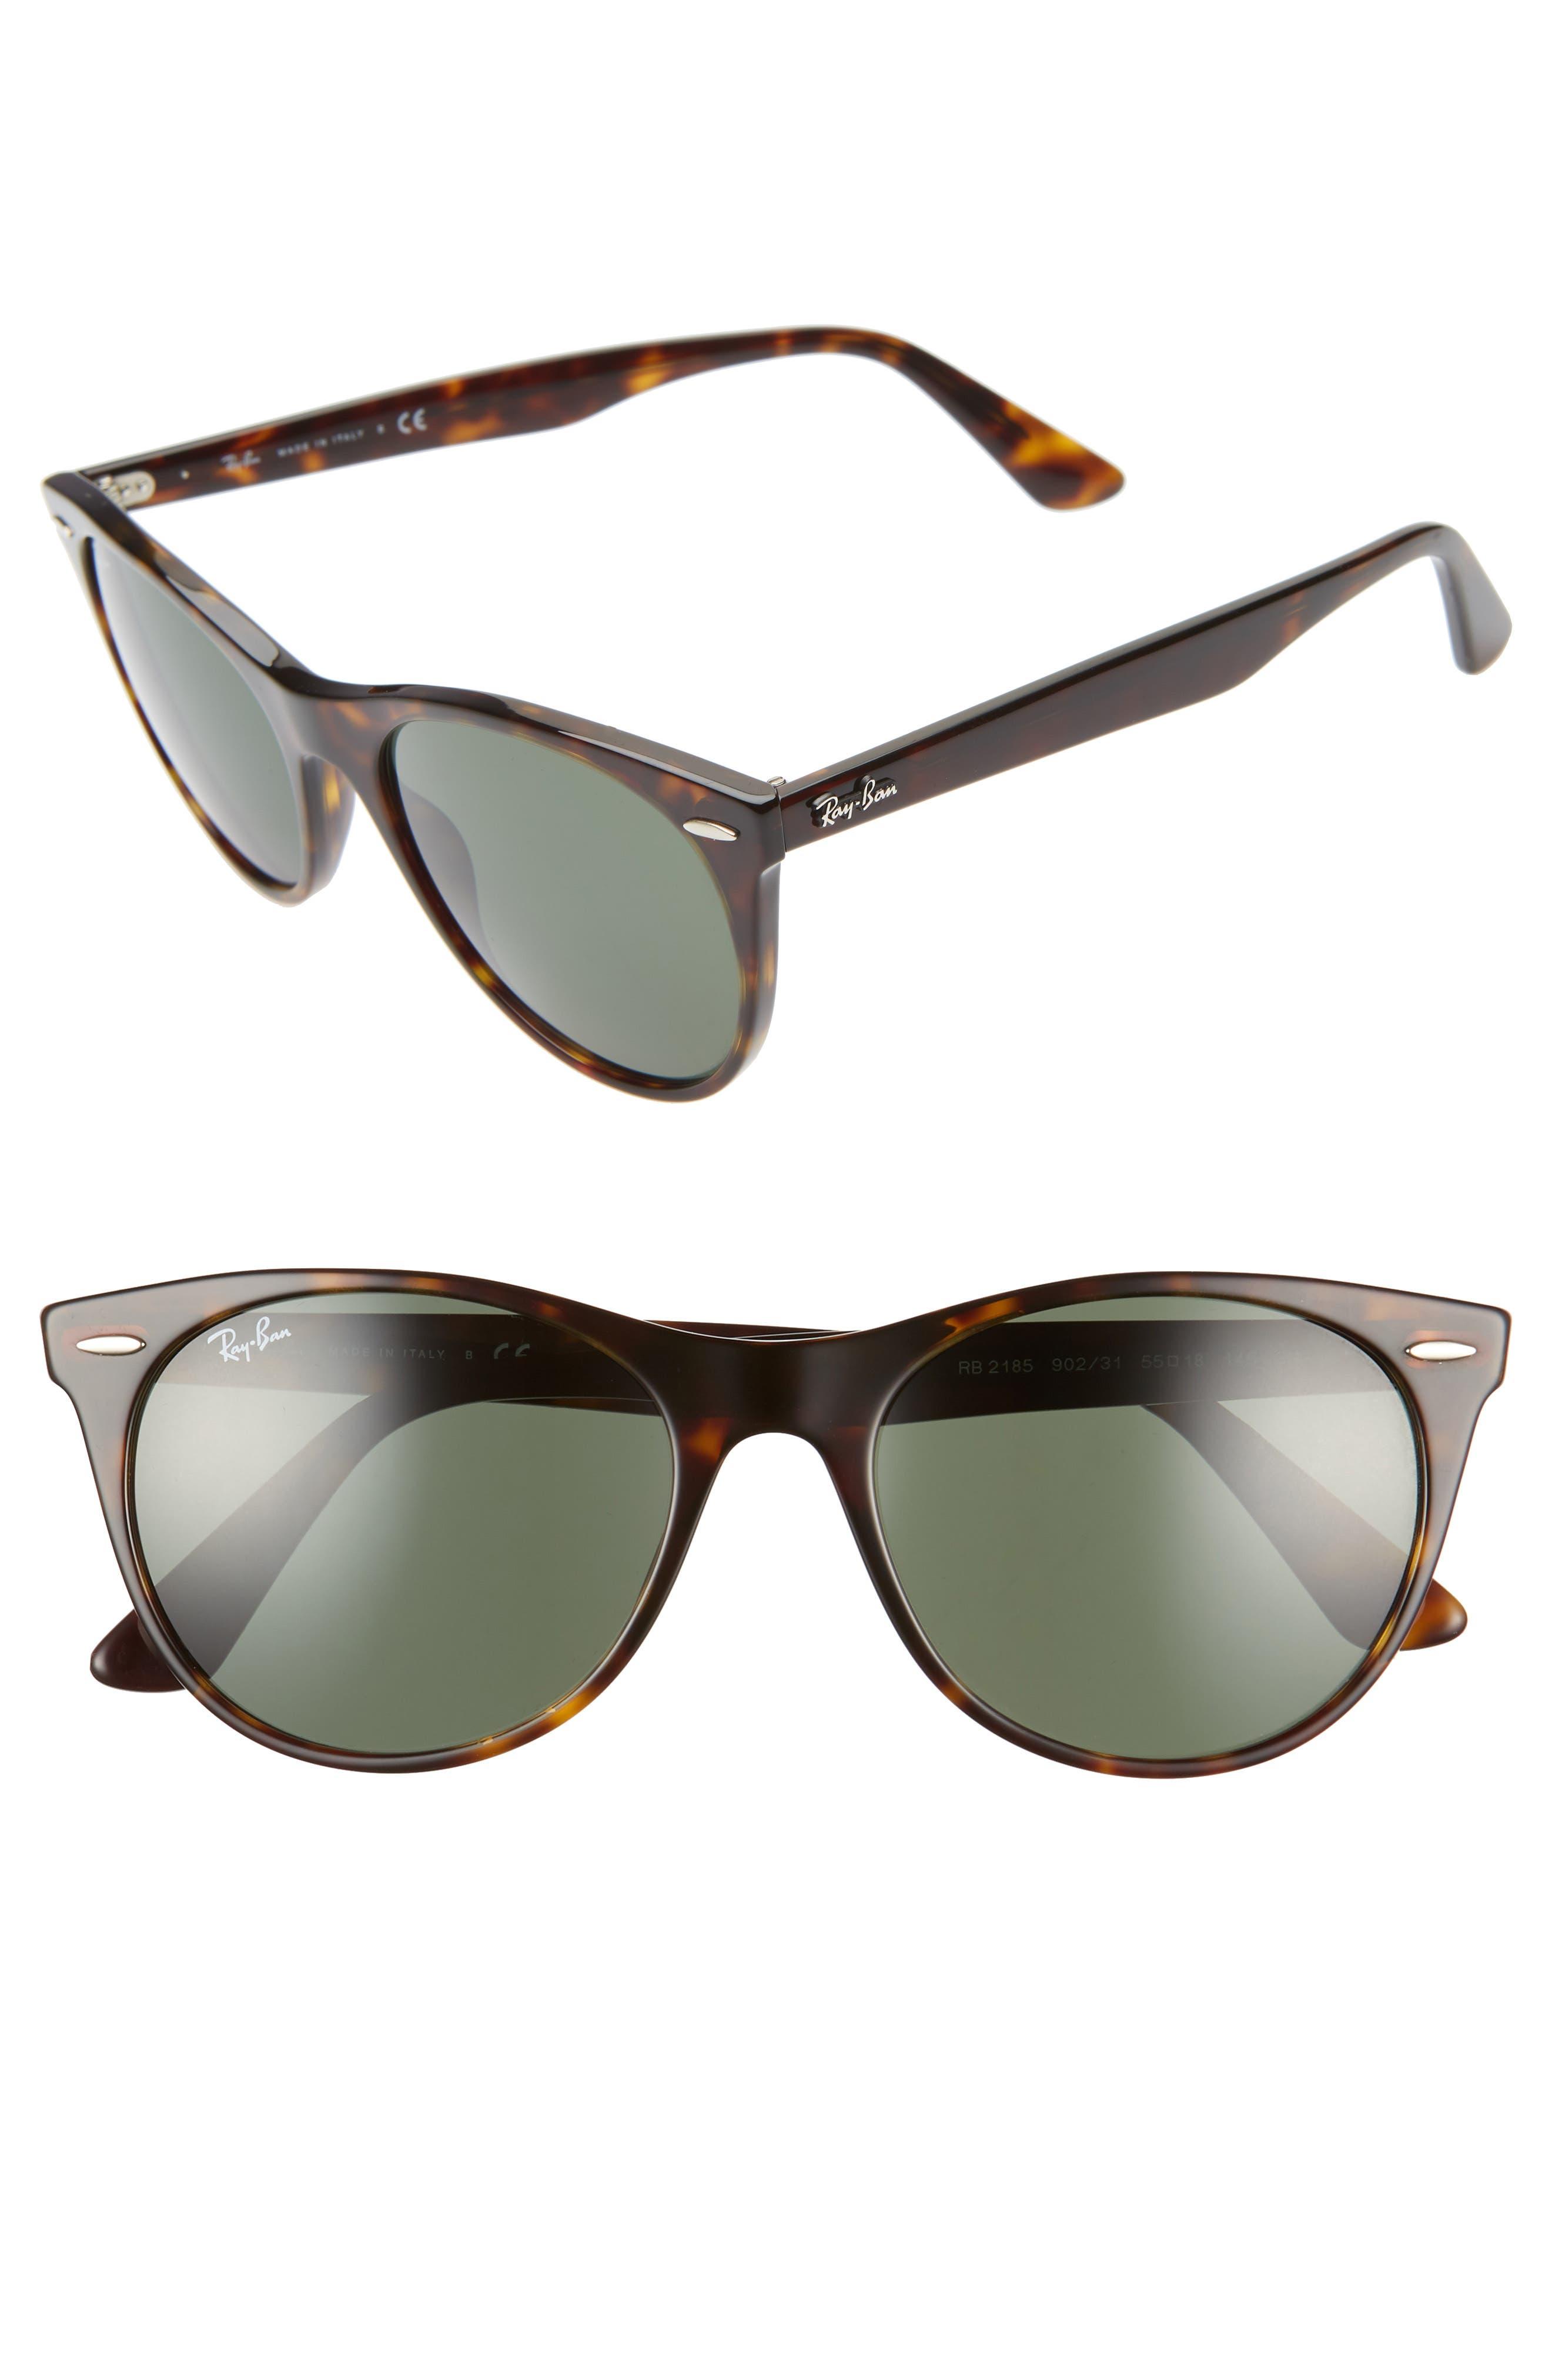 Ray-Ban 55Mm Round Wayfarer Sunglasses - Havana Solid